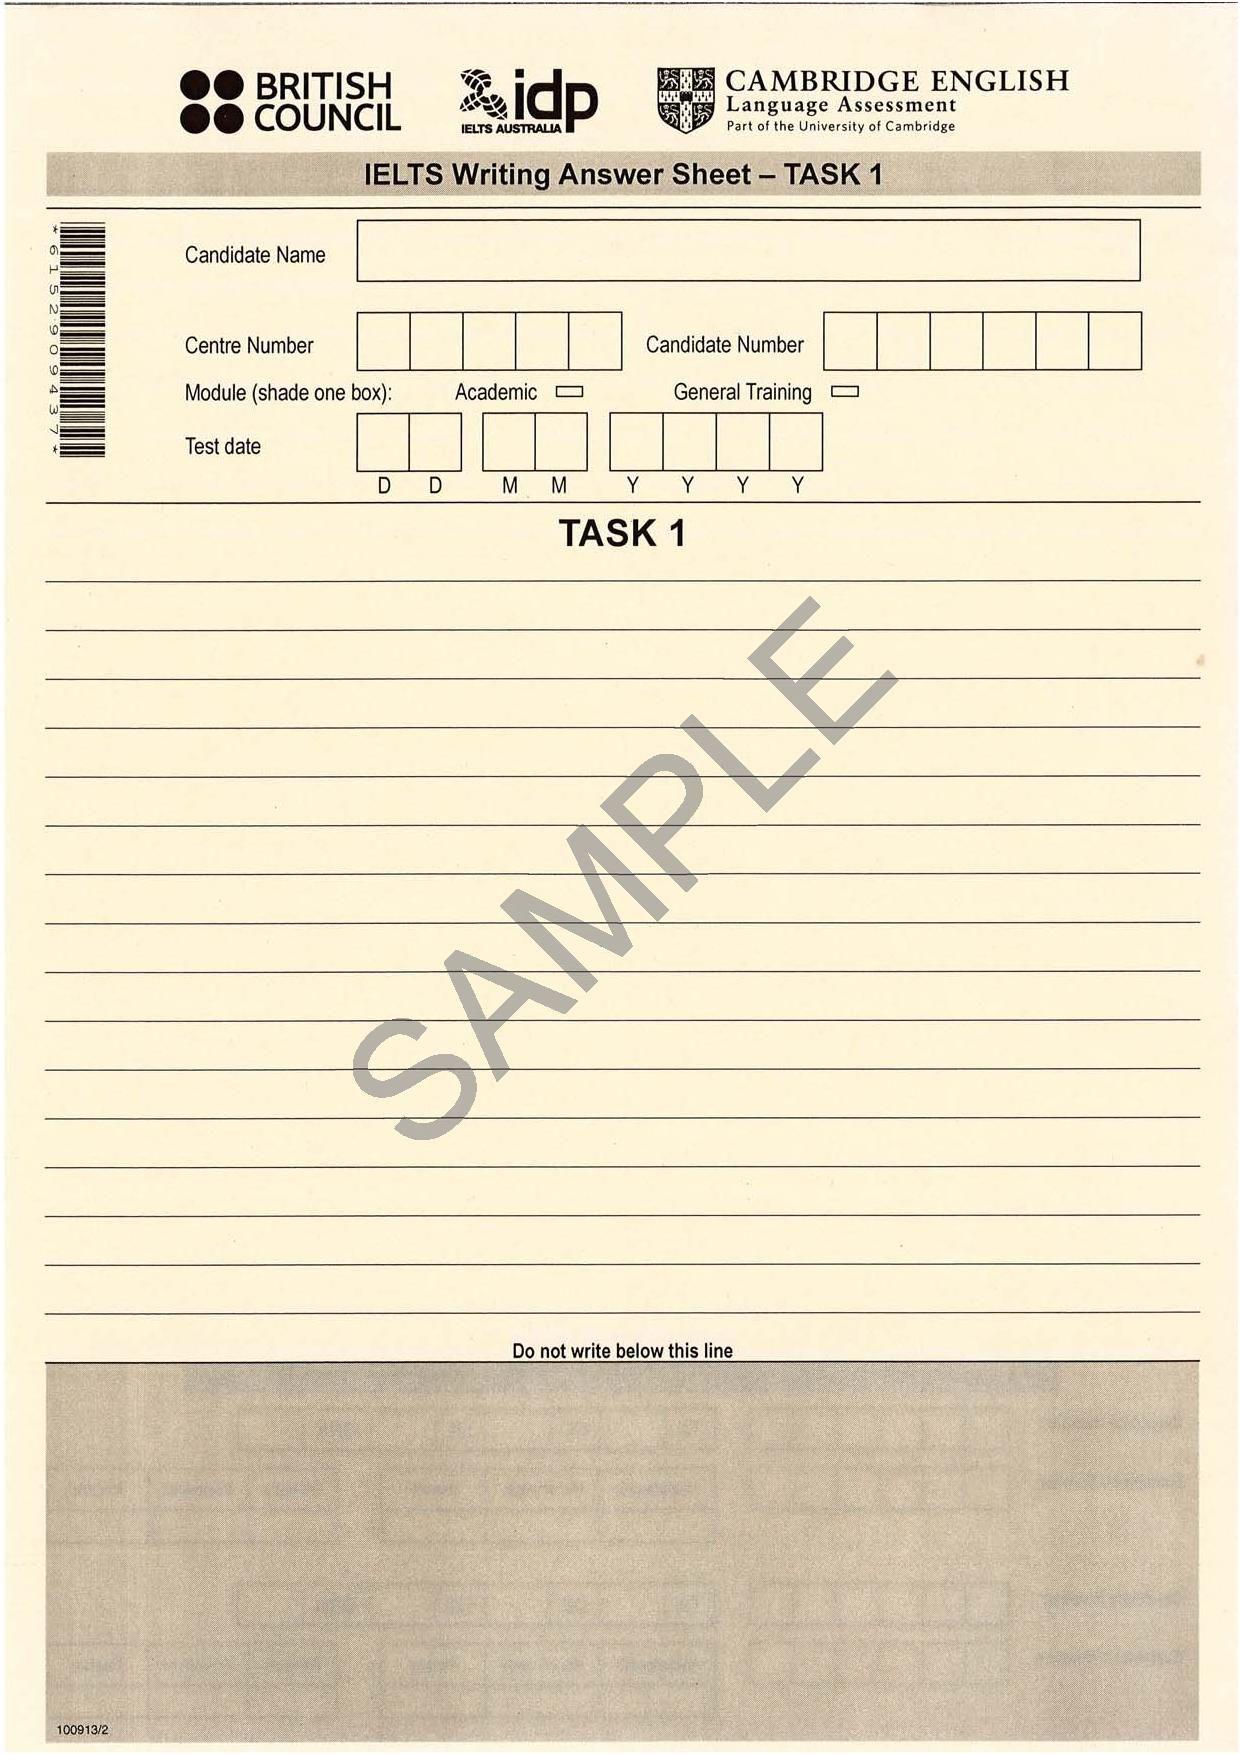 Ielts Writing Task 1 Answer Sheet Front